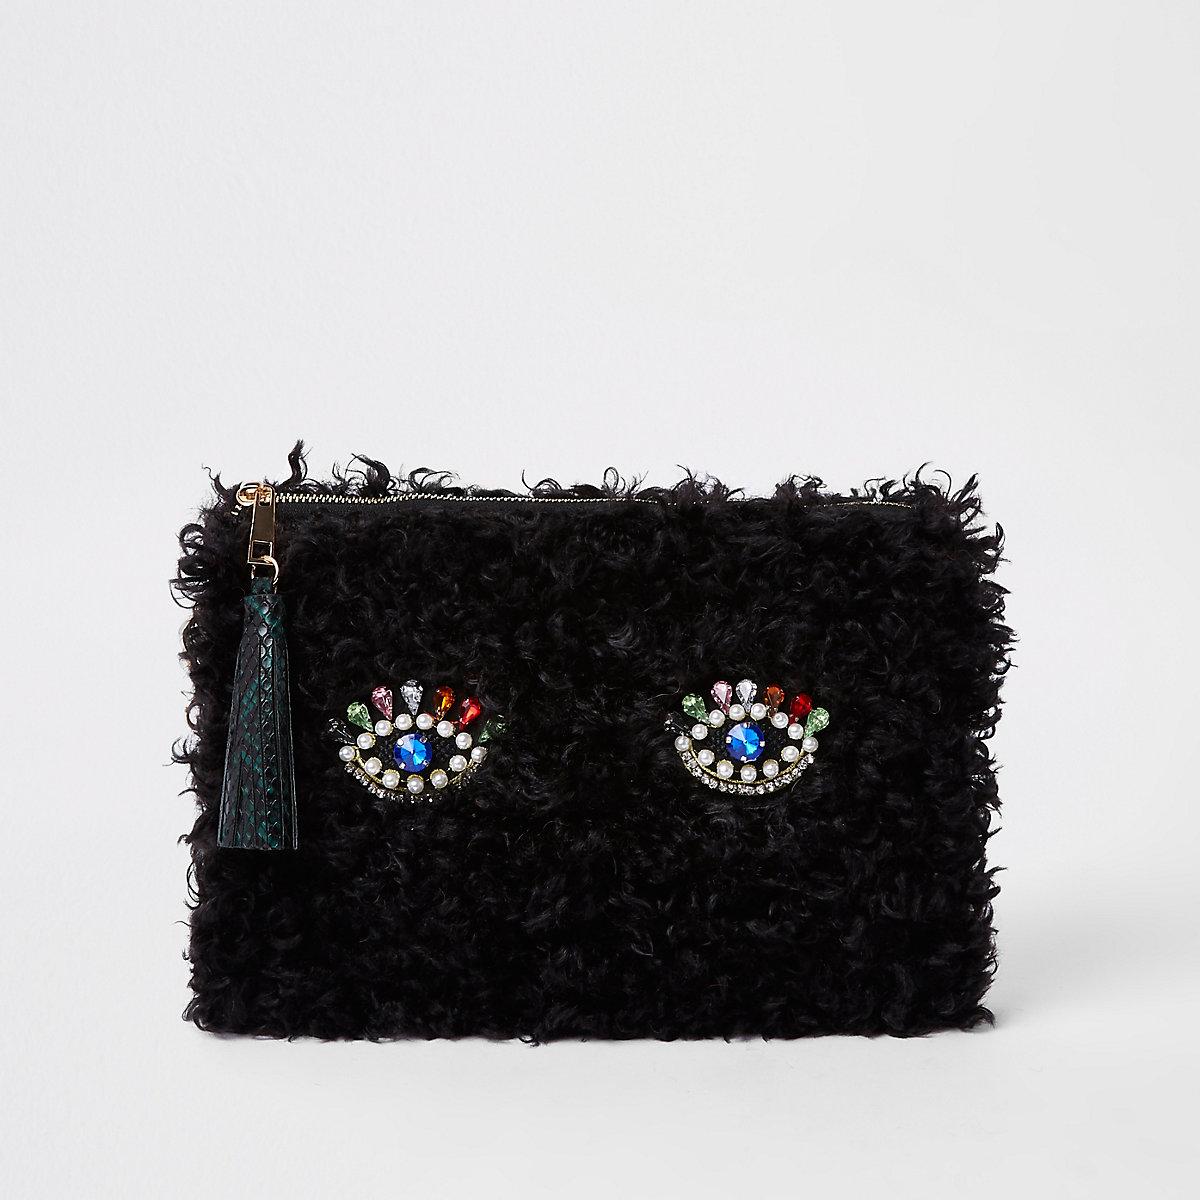 Black borg embellished eye clutch bag